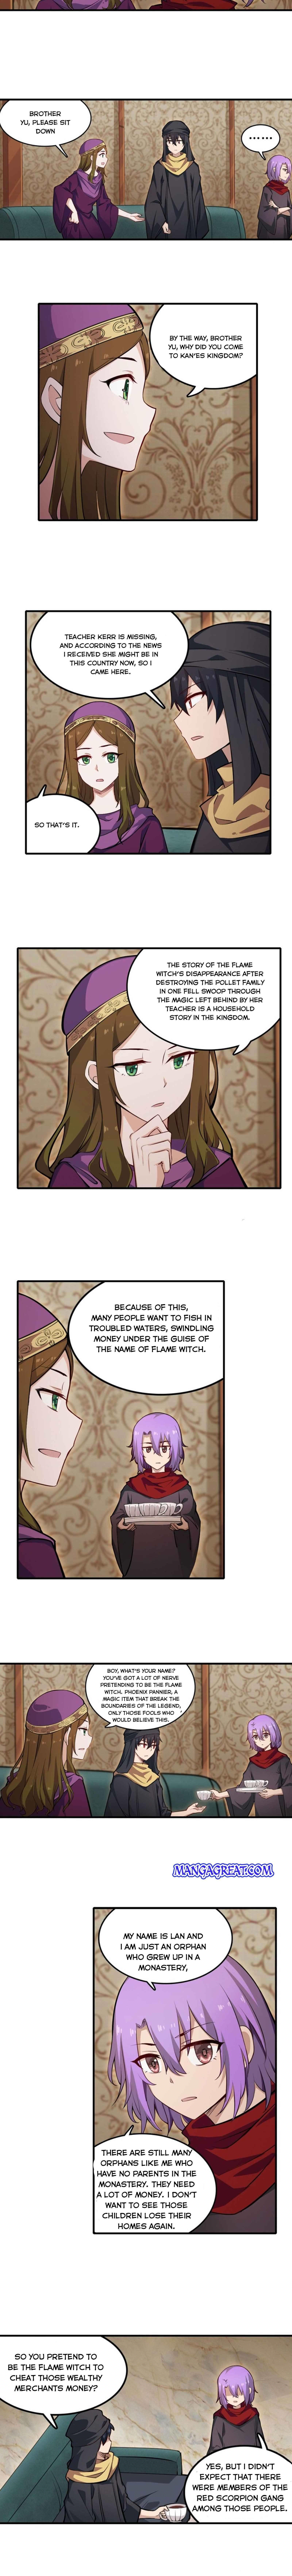 Infinite Apostles And Twelve War Girls Chapter 149 page 2 - Mangakakalots.com